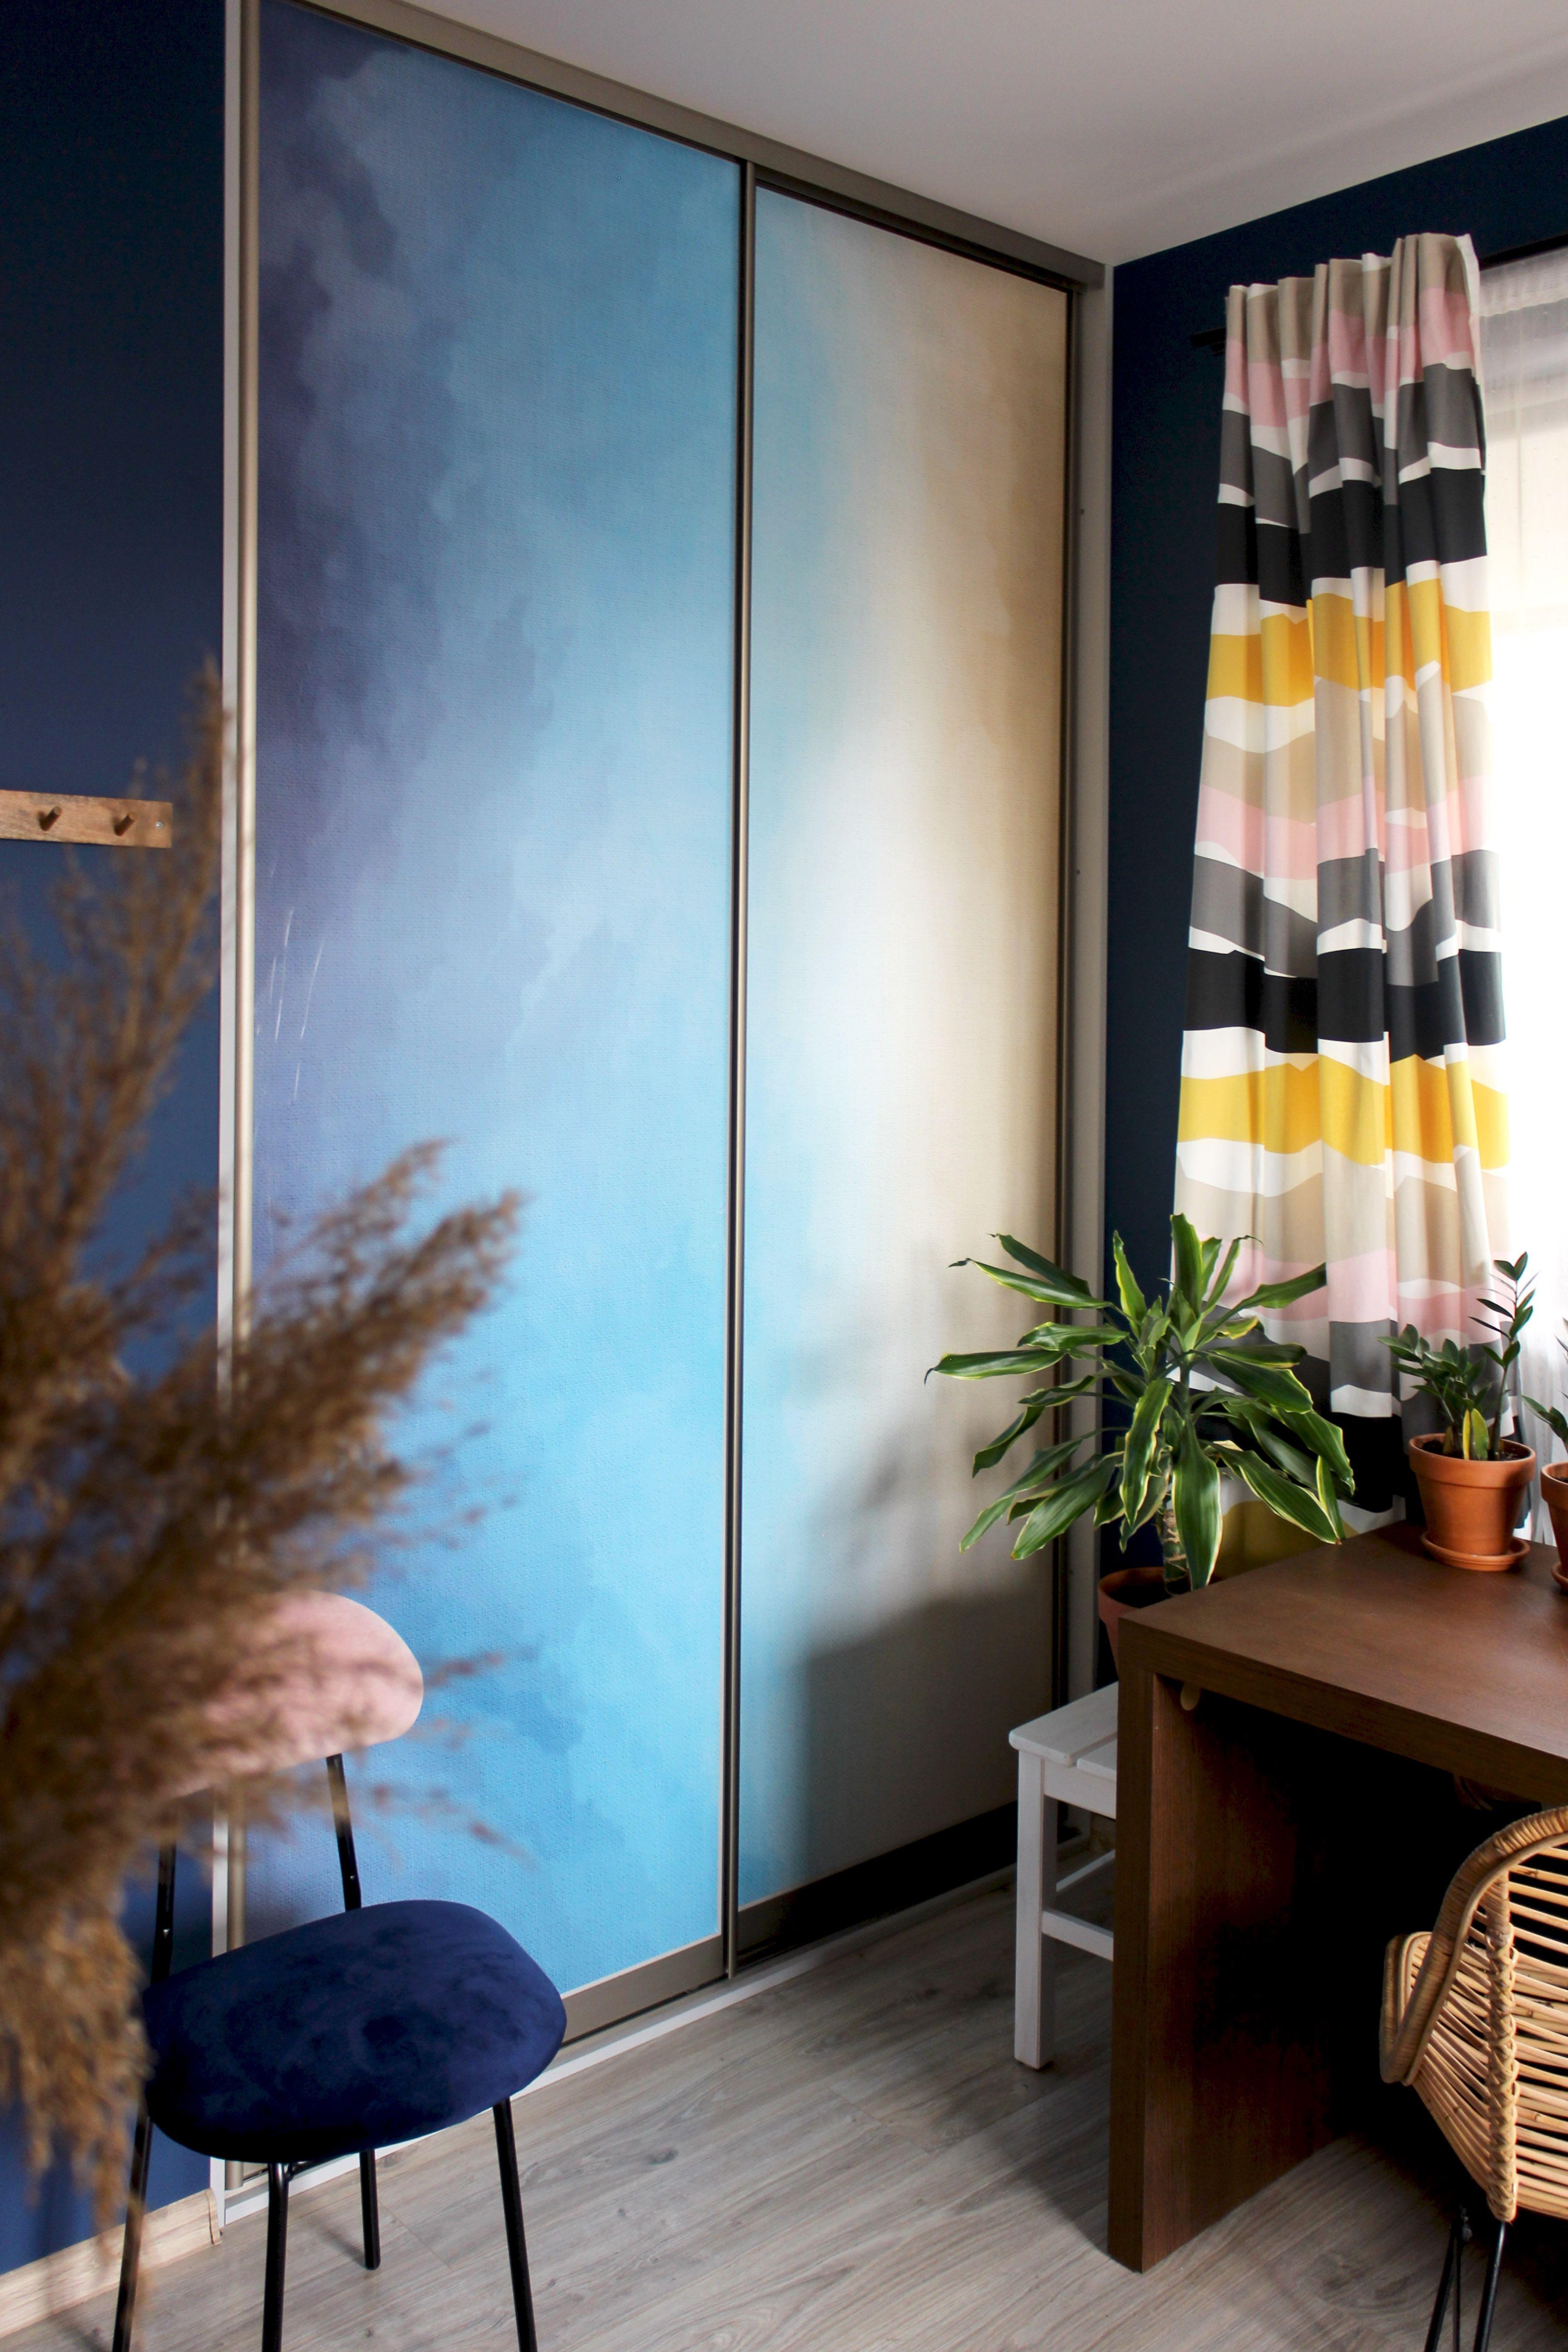 Beautiful Abstract Wallpaper On The Wardrobe Door Lovely Peel Stick Way To Upgrade The Room Walldecor Wallpap Closet Door Makeover Closet Doors White Closet